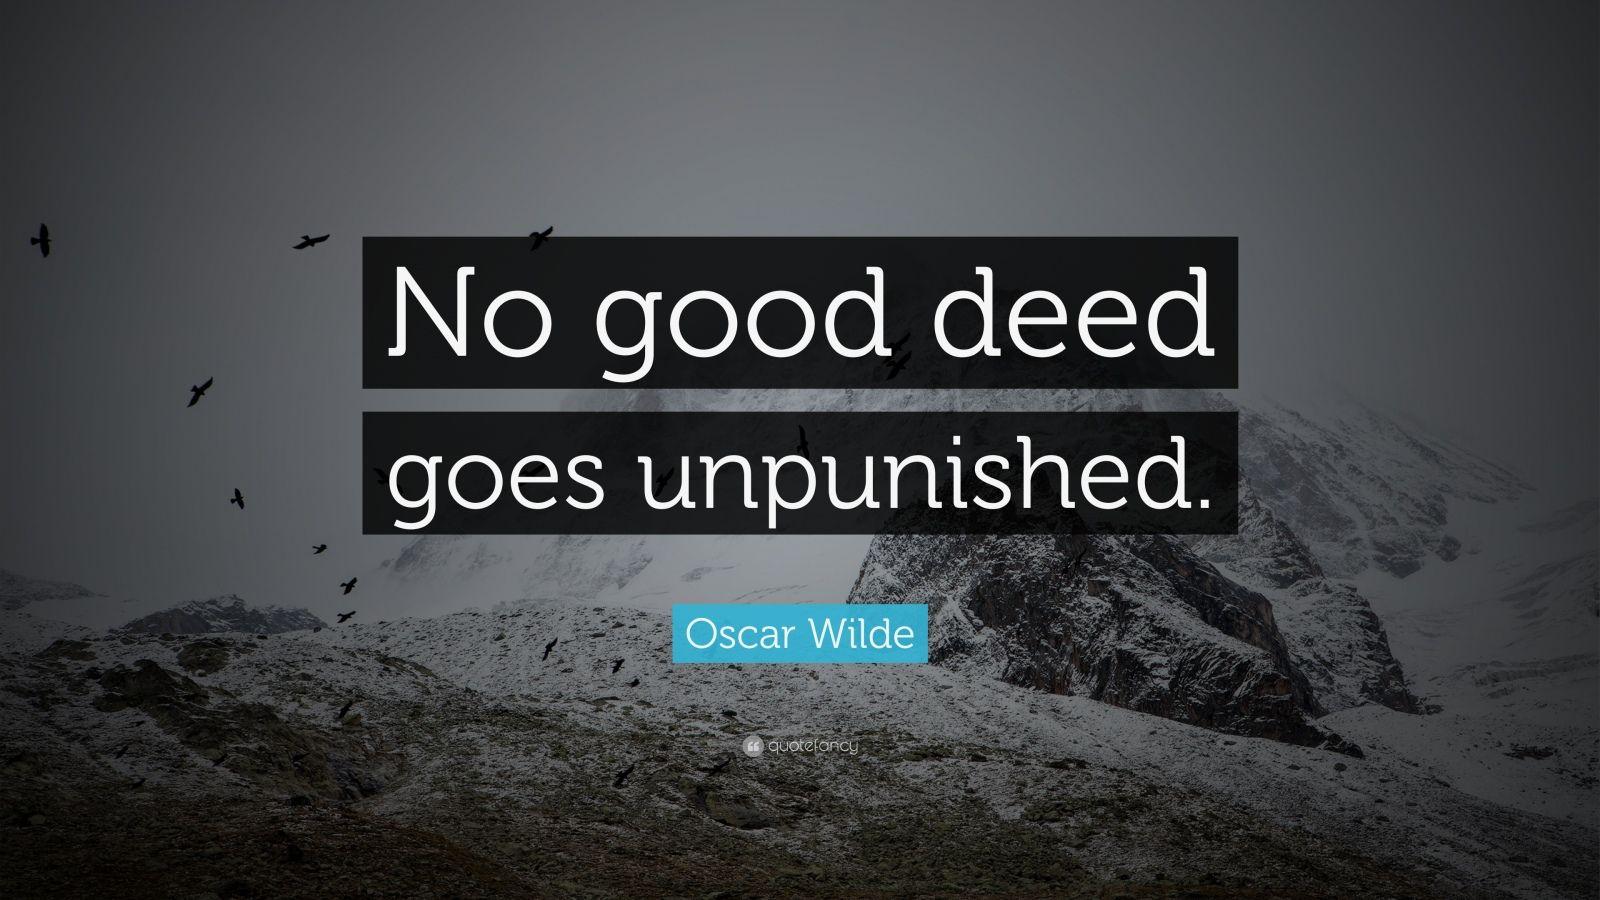 no good deed goes unpunished Oscar wilde — 'no good deed goes unpunished.